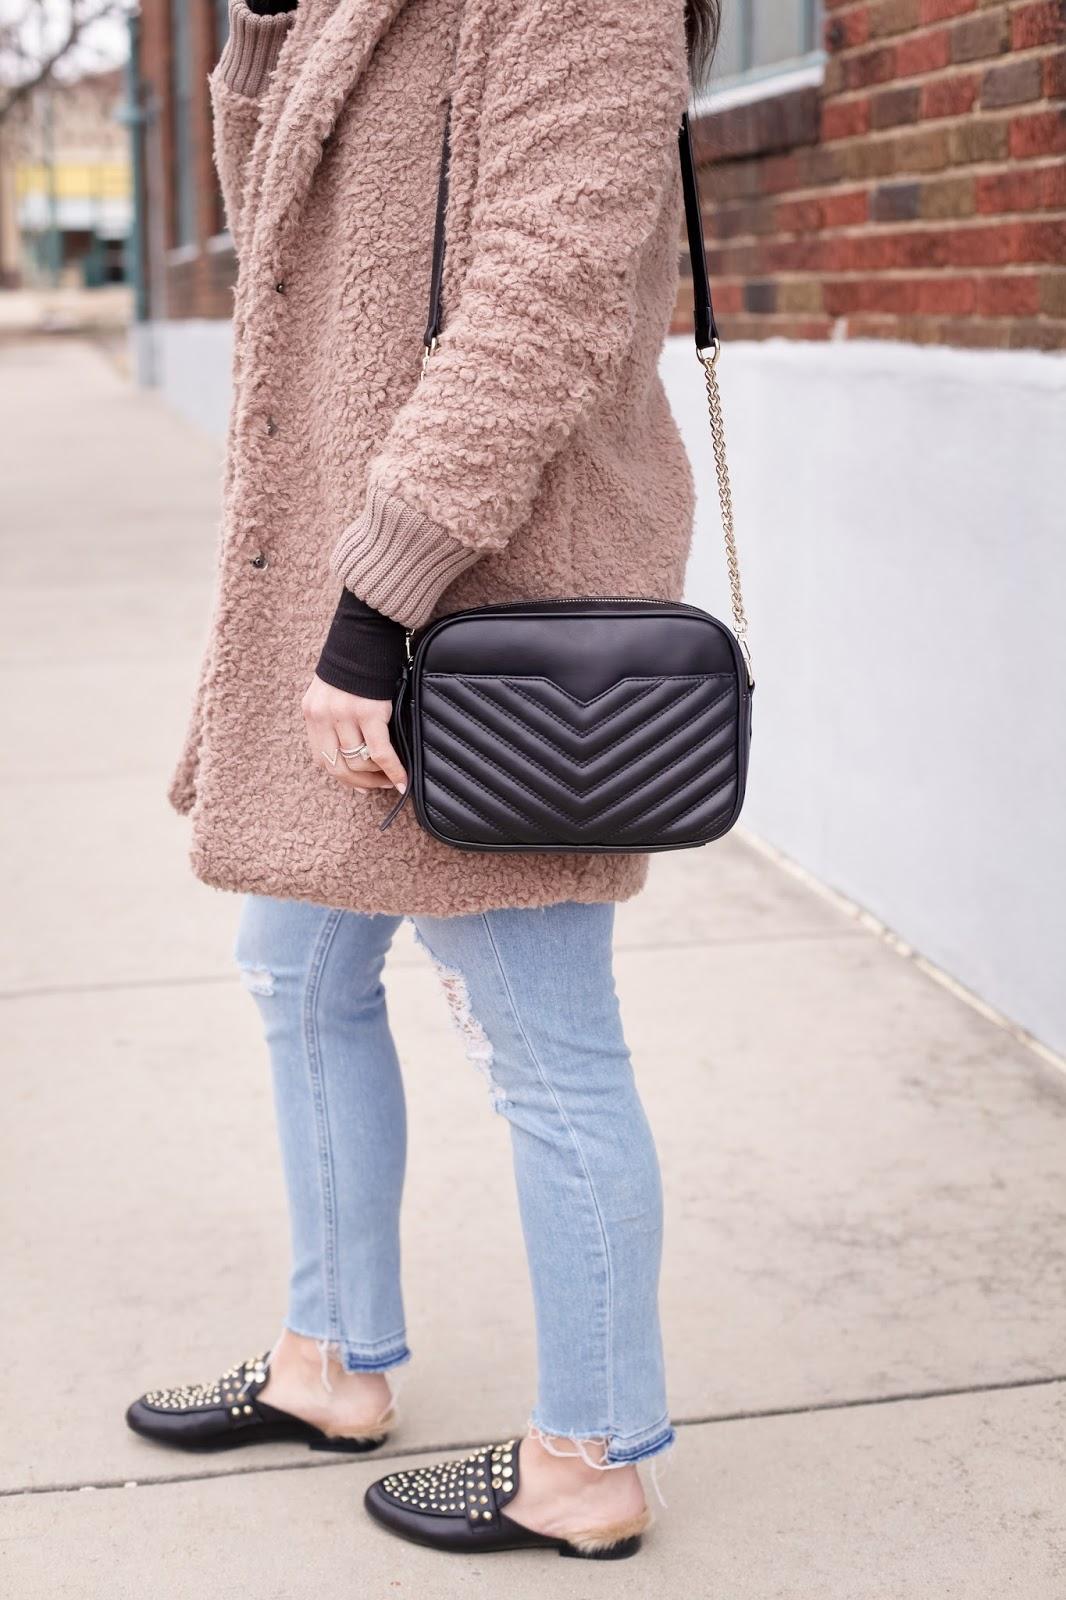 Stylish ways to style a teddy coat.